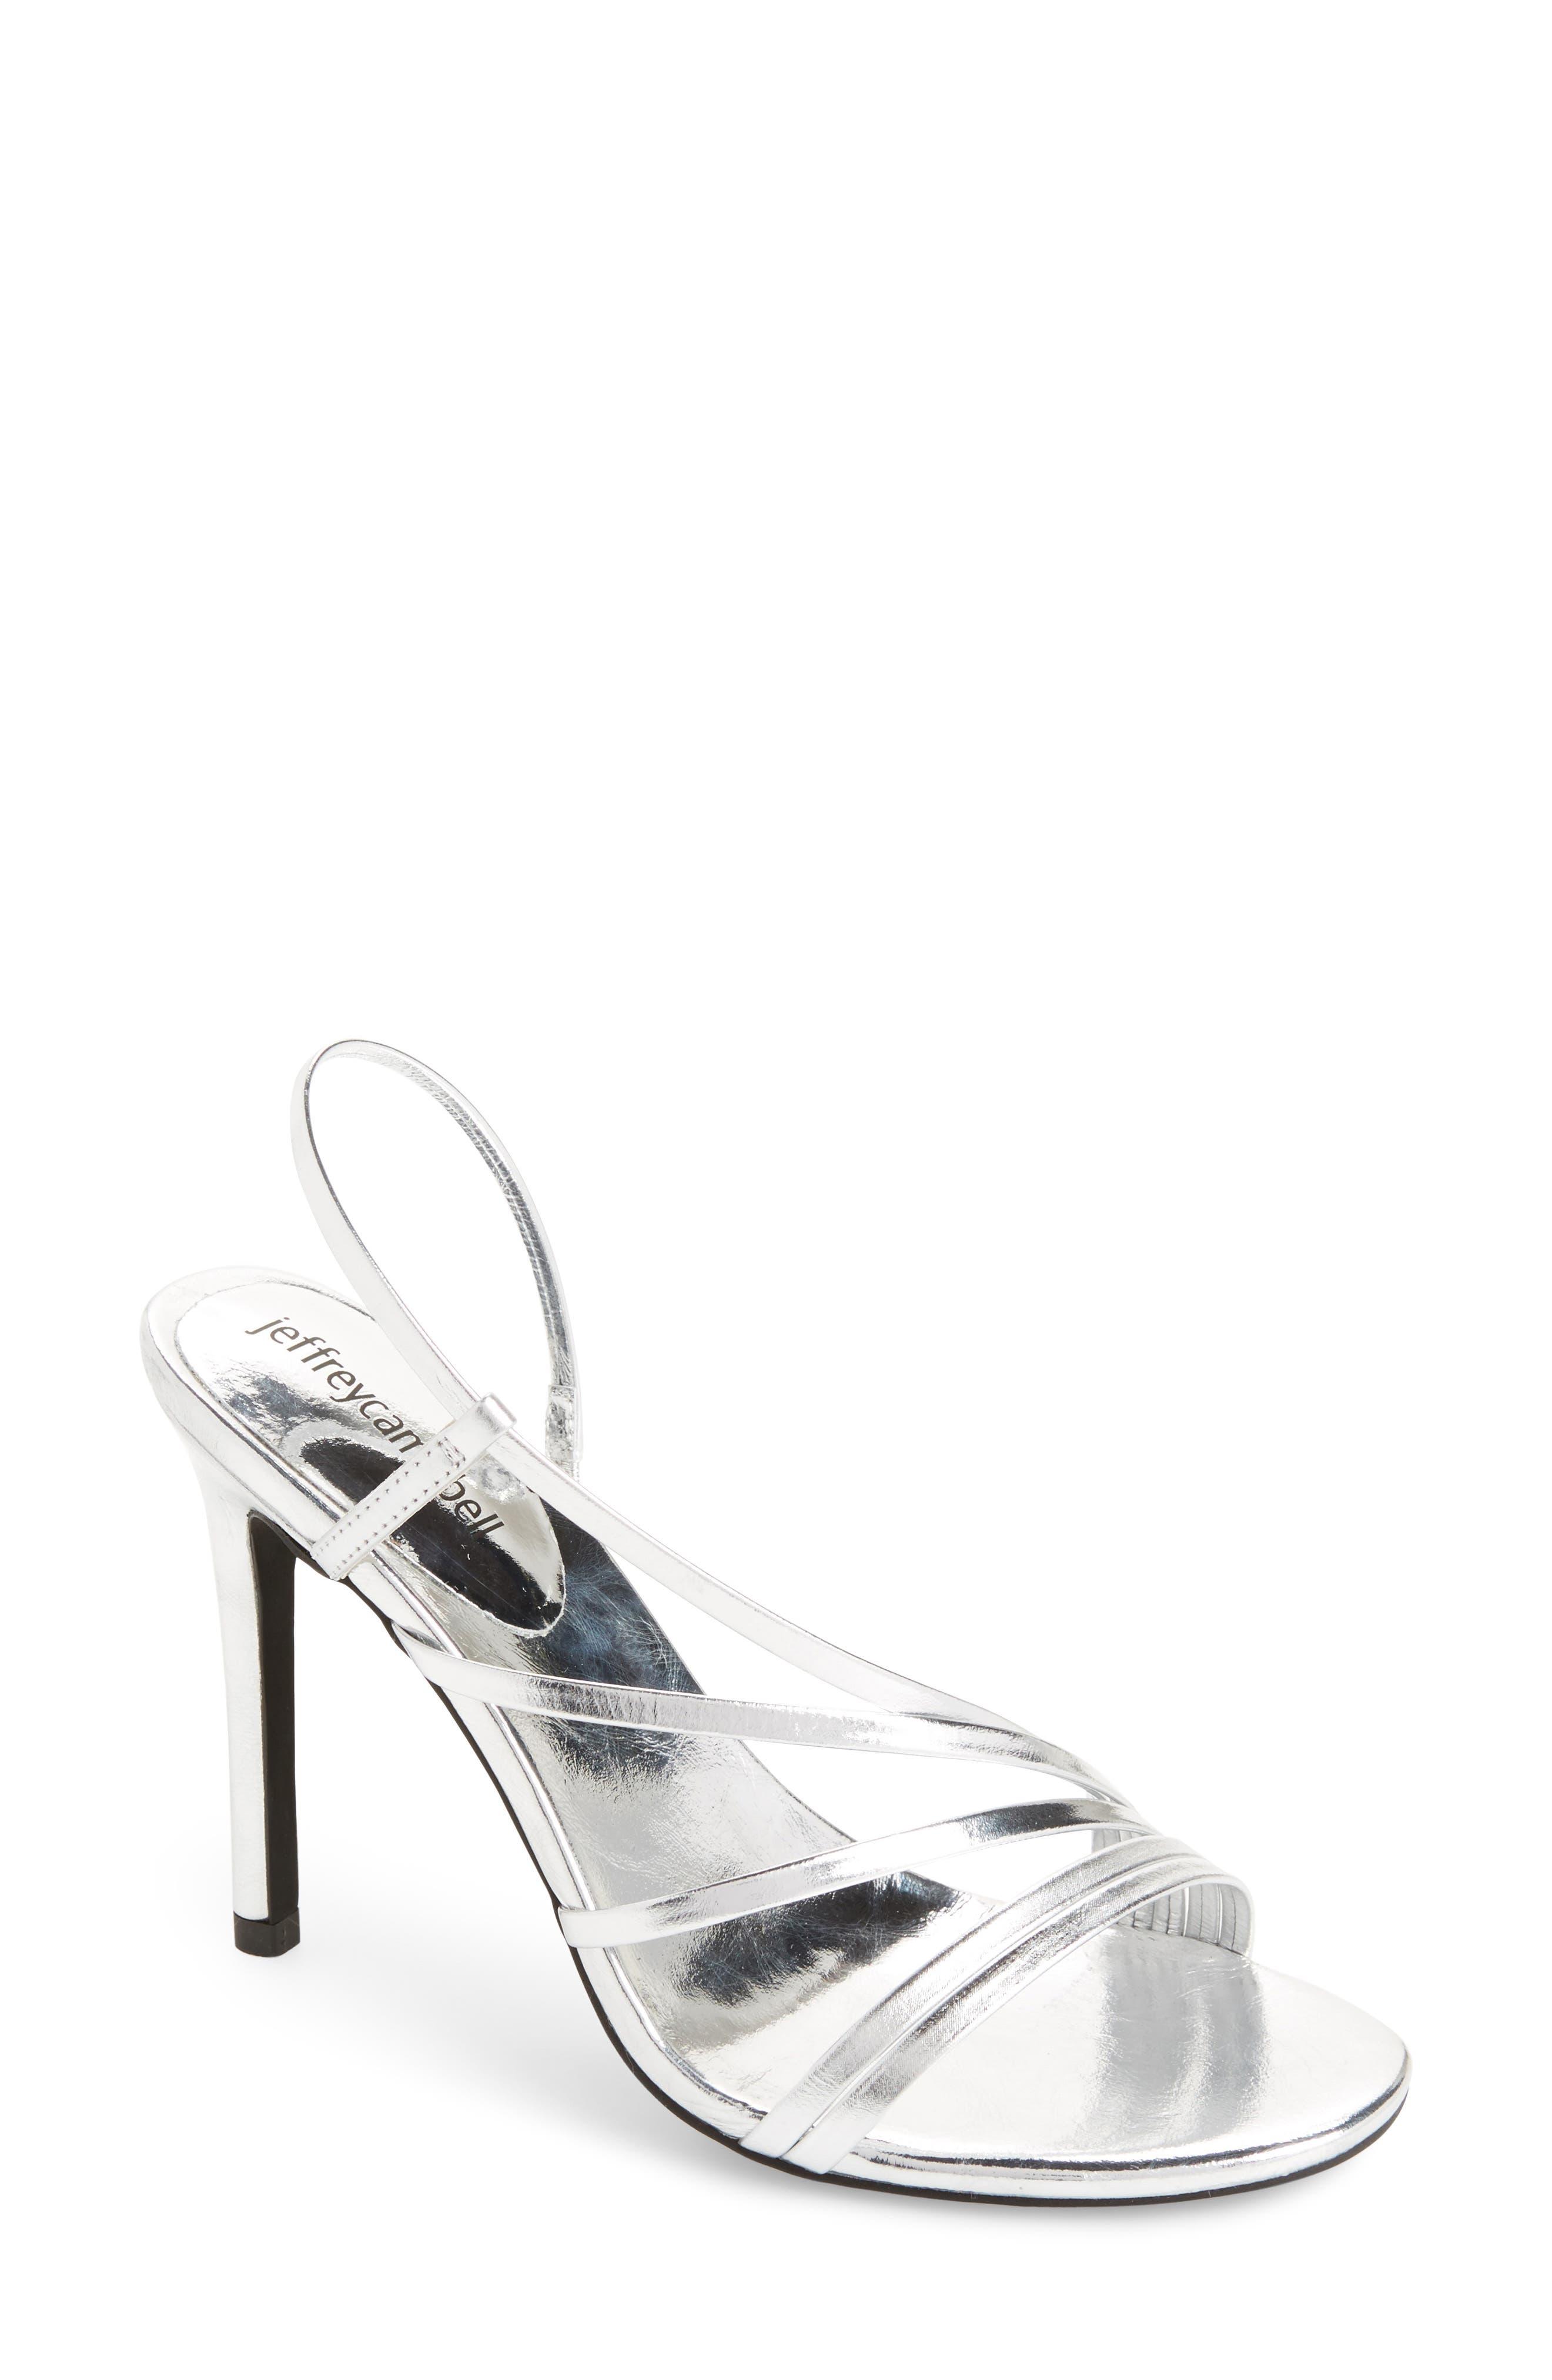 Lilian Asymmetrical Strappy Sandal,                             Main thumbnail 1, color,                             Silver Leather